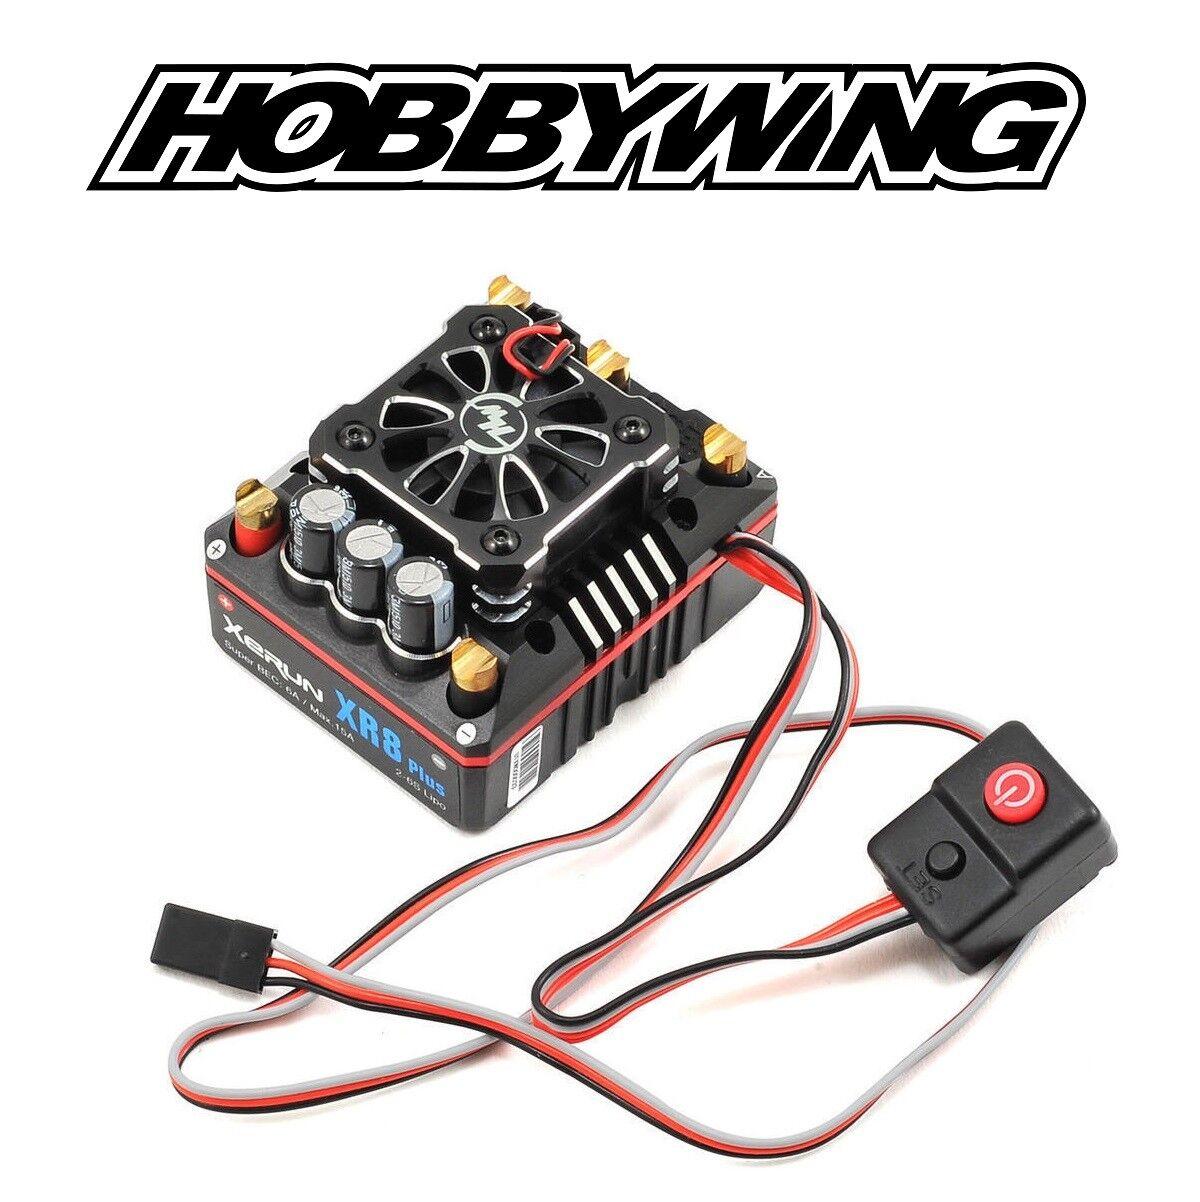 Hobbywing XERUN XR8 Plus Esc sin escobillas Sensorojo 2-6S 1 8 RC coche carro